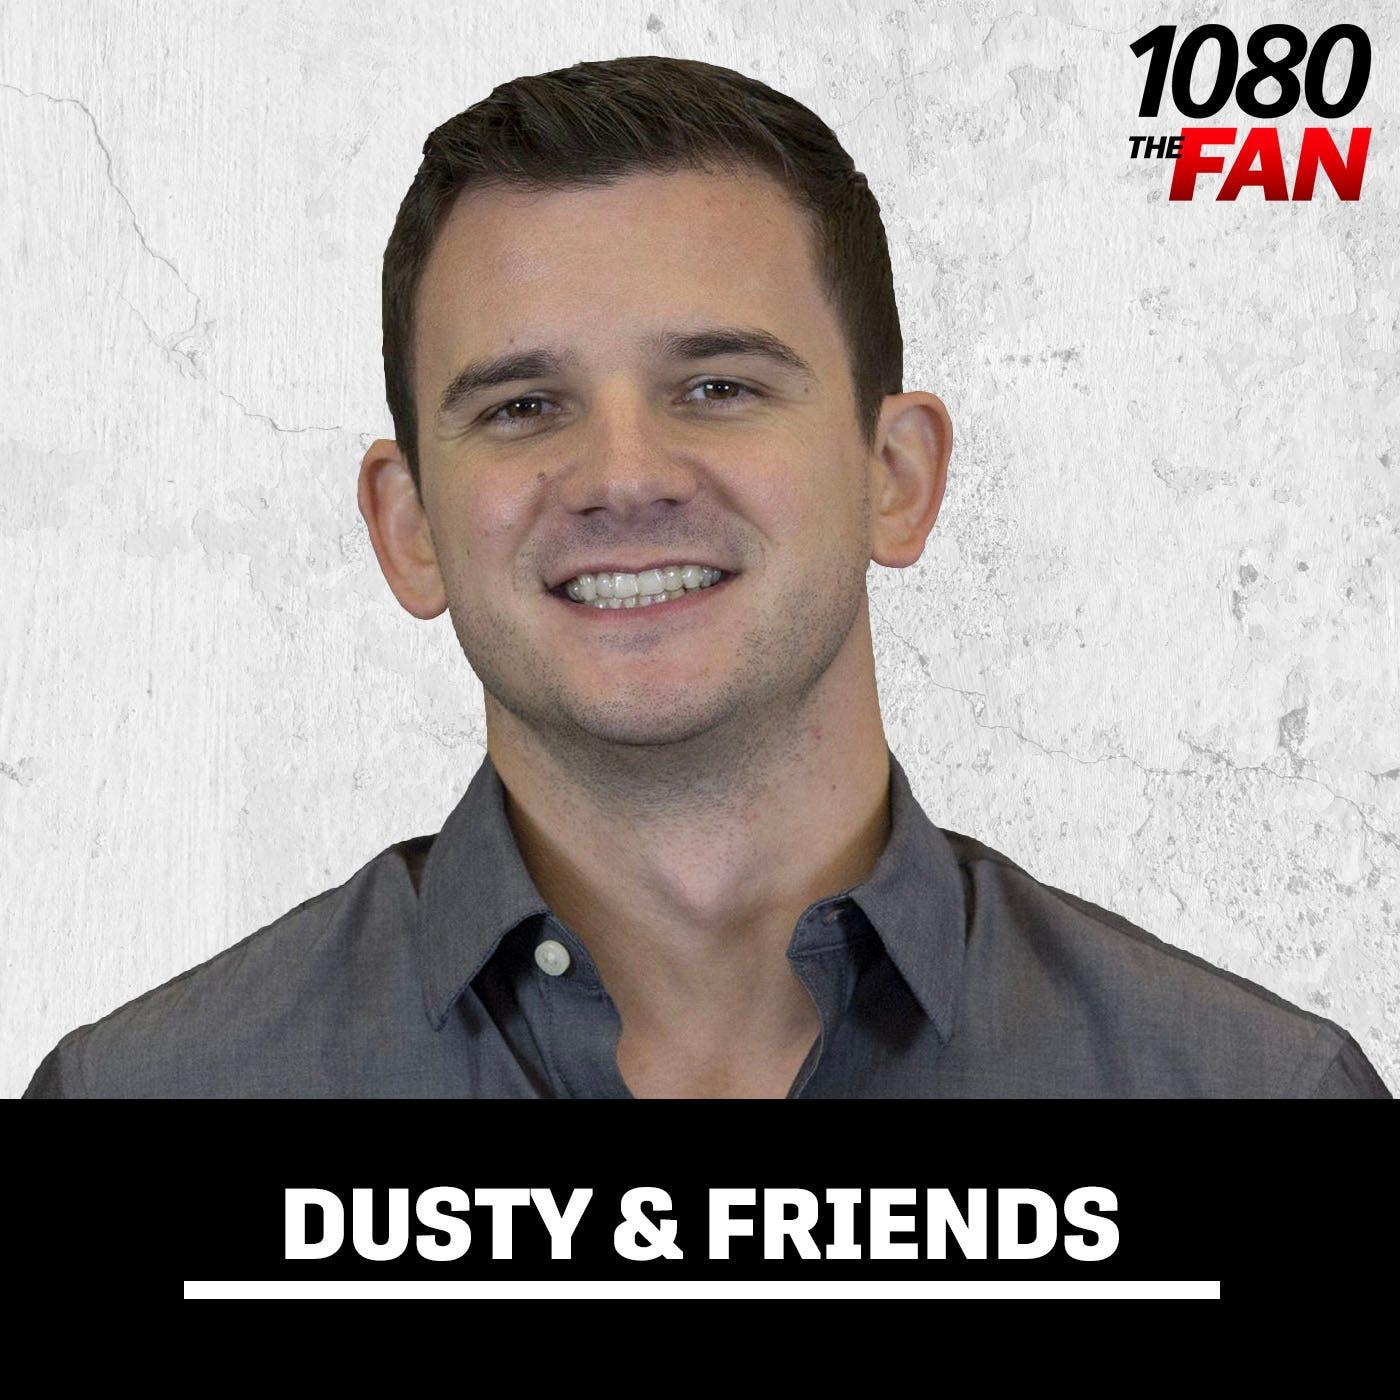 AJ and Dusty